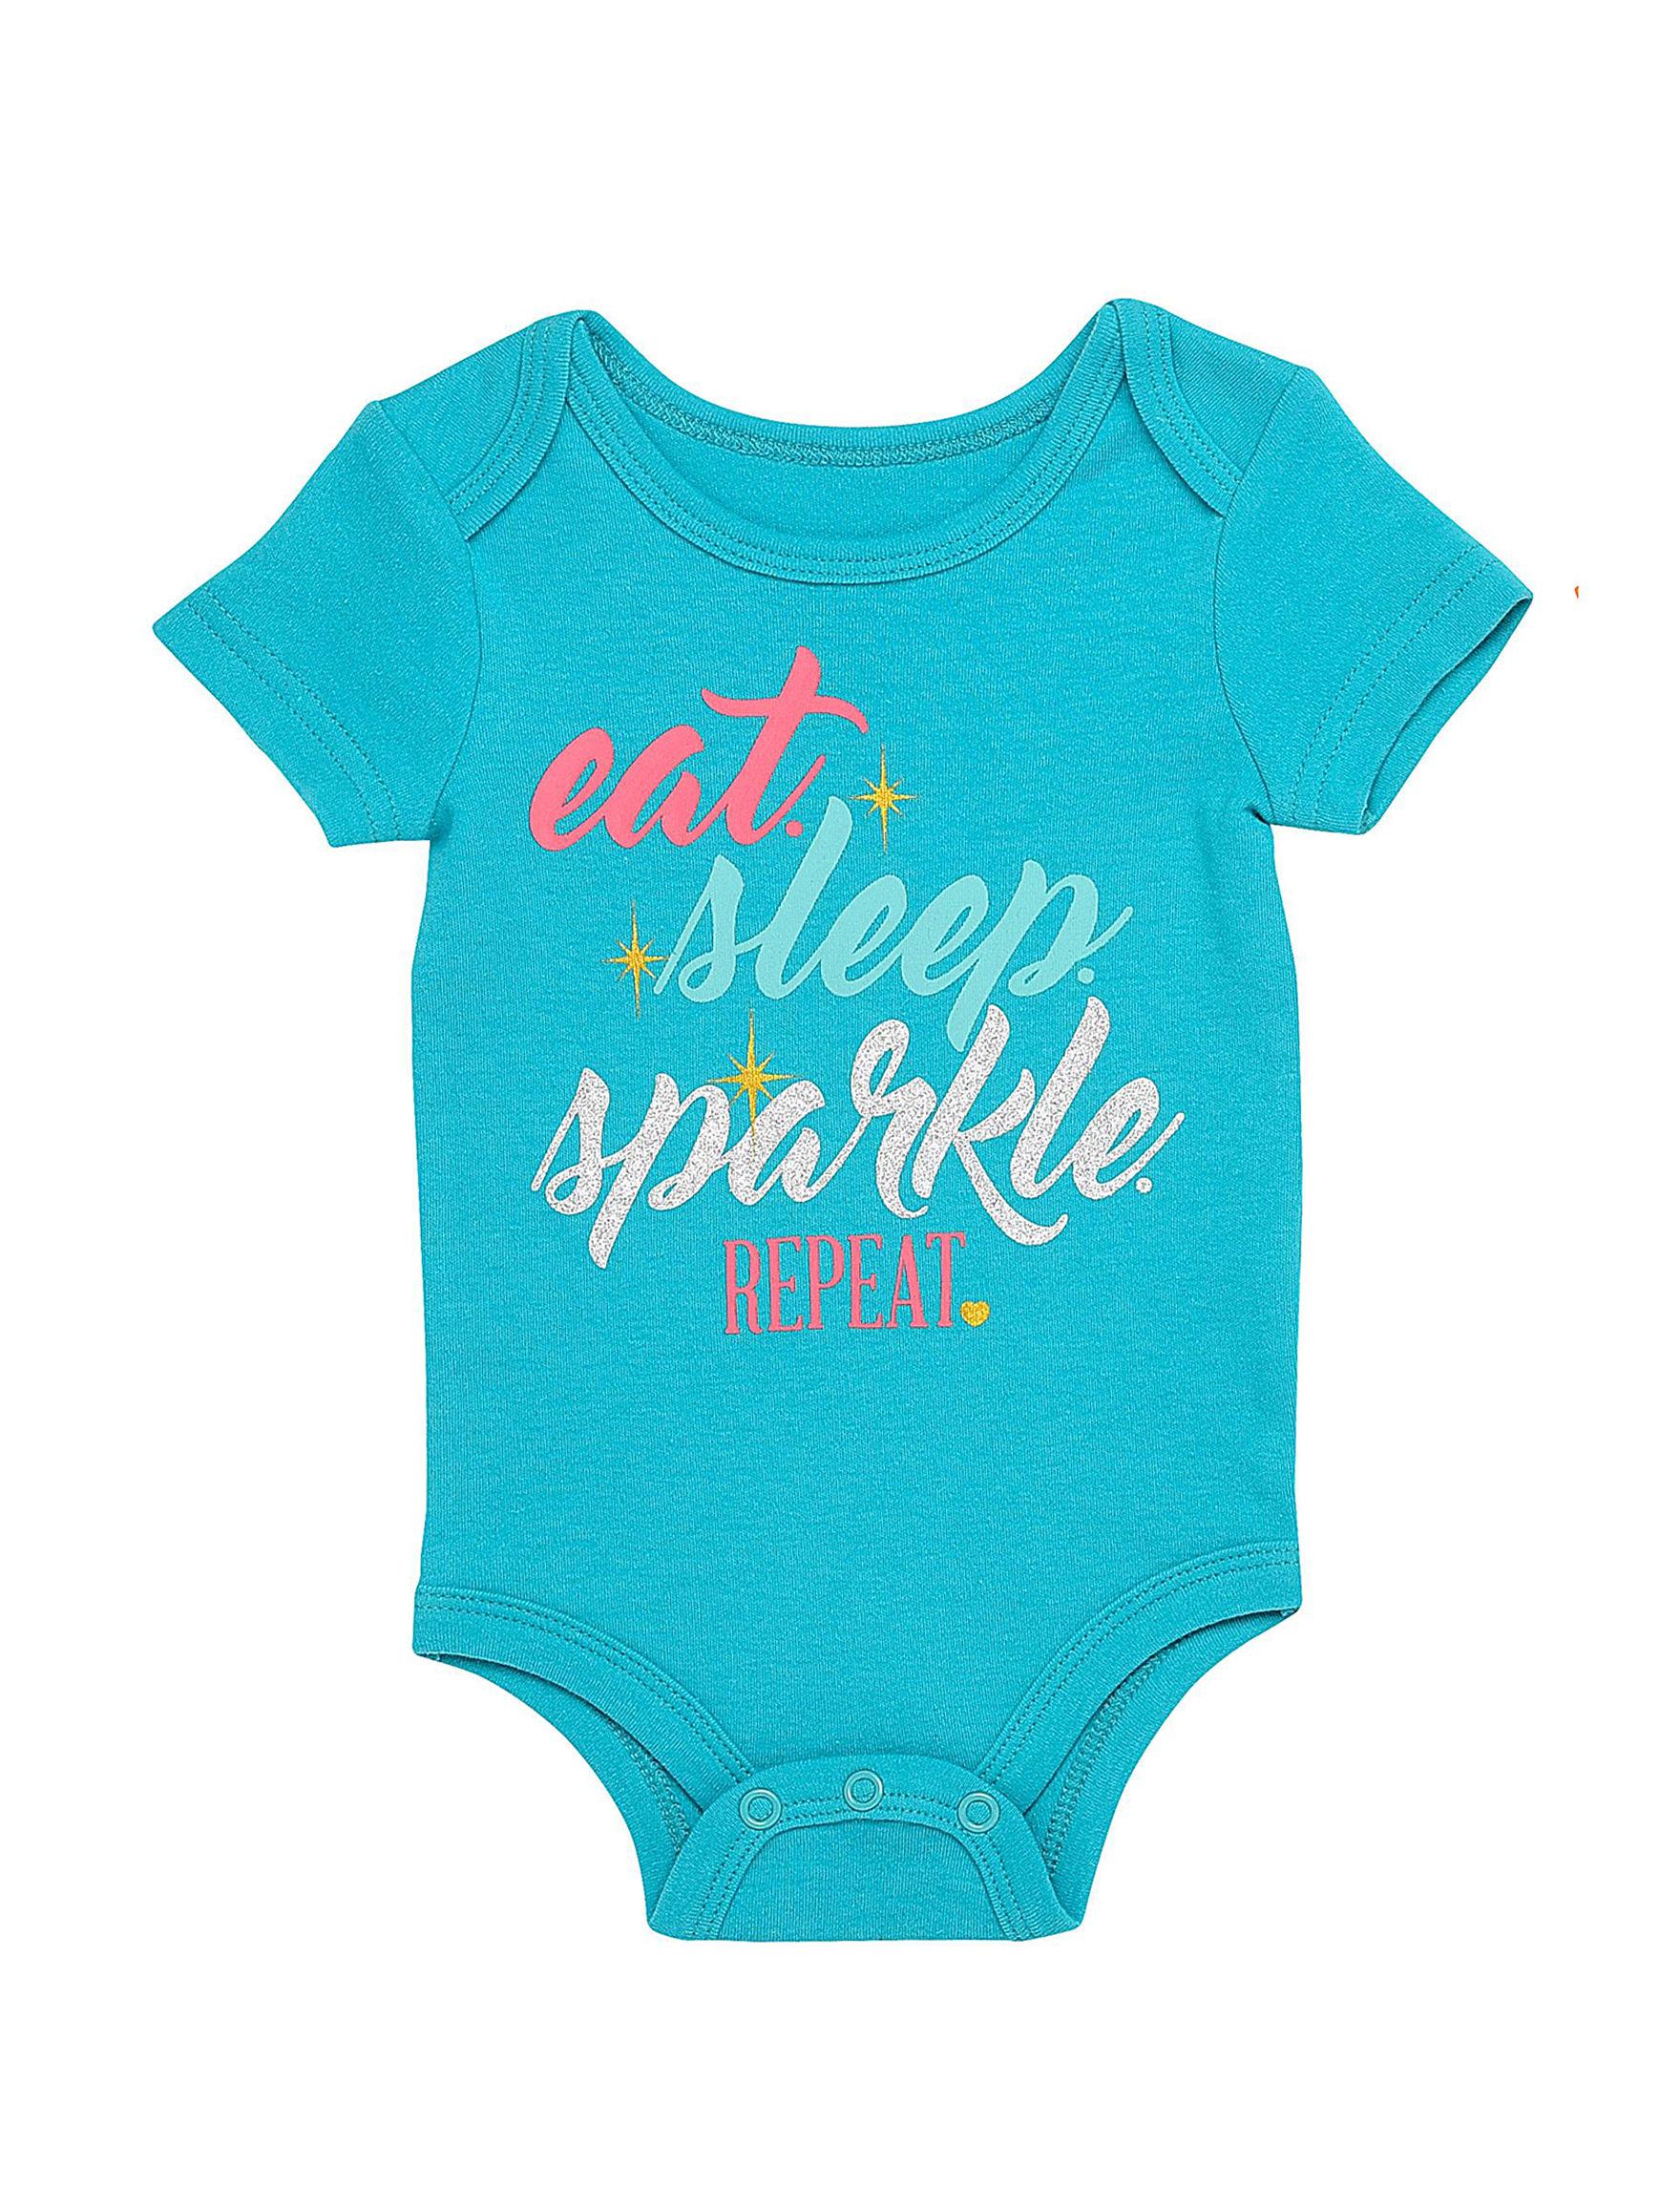 Babies With Attitude Aqua